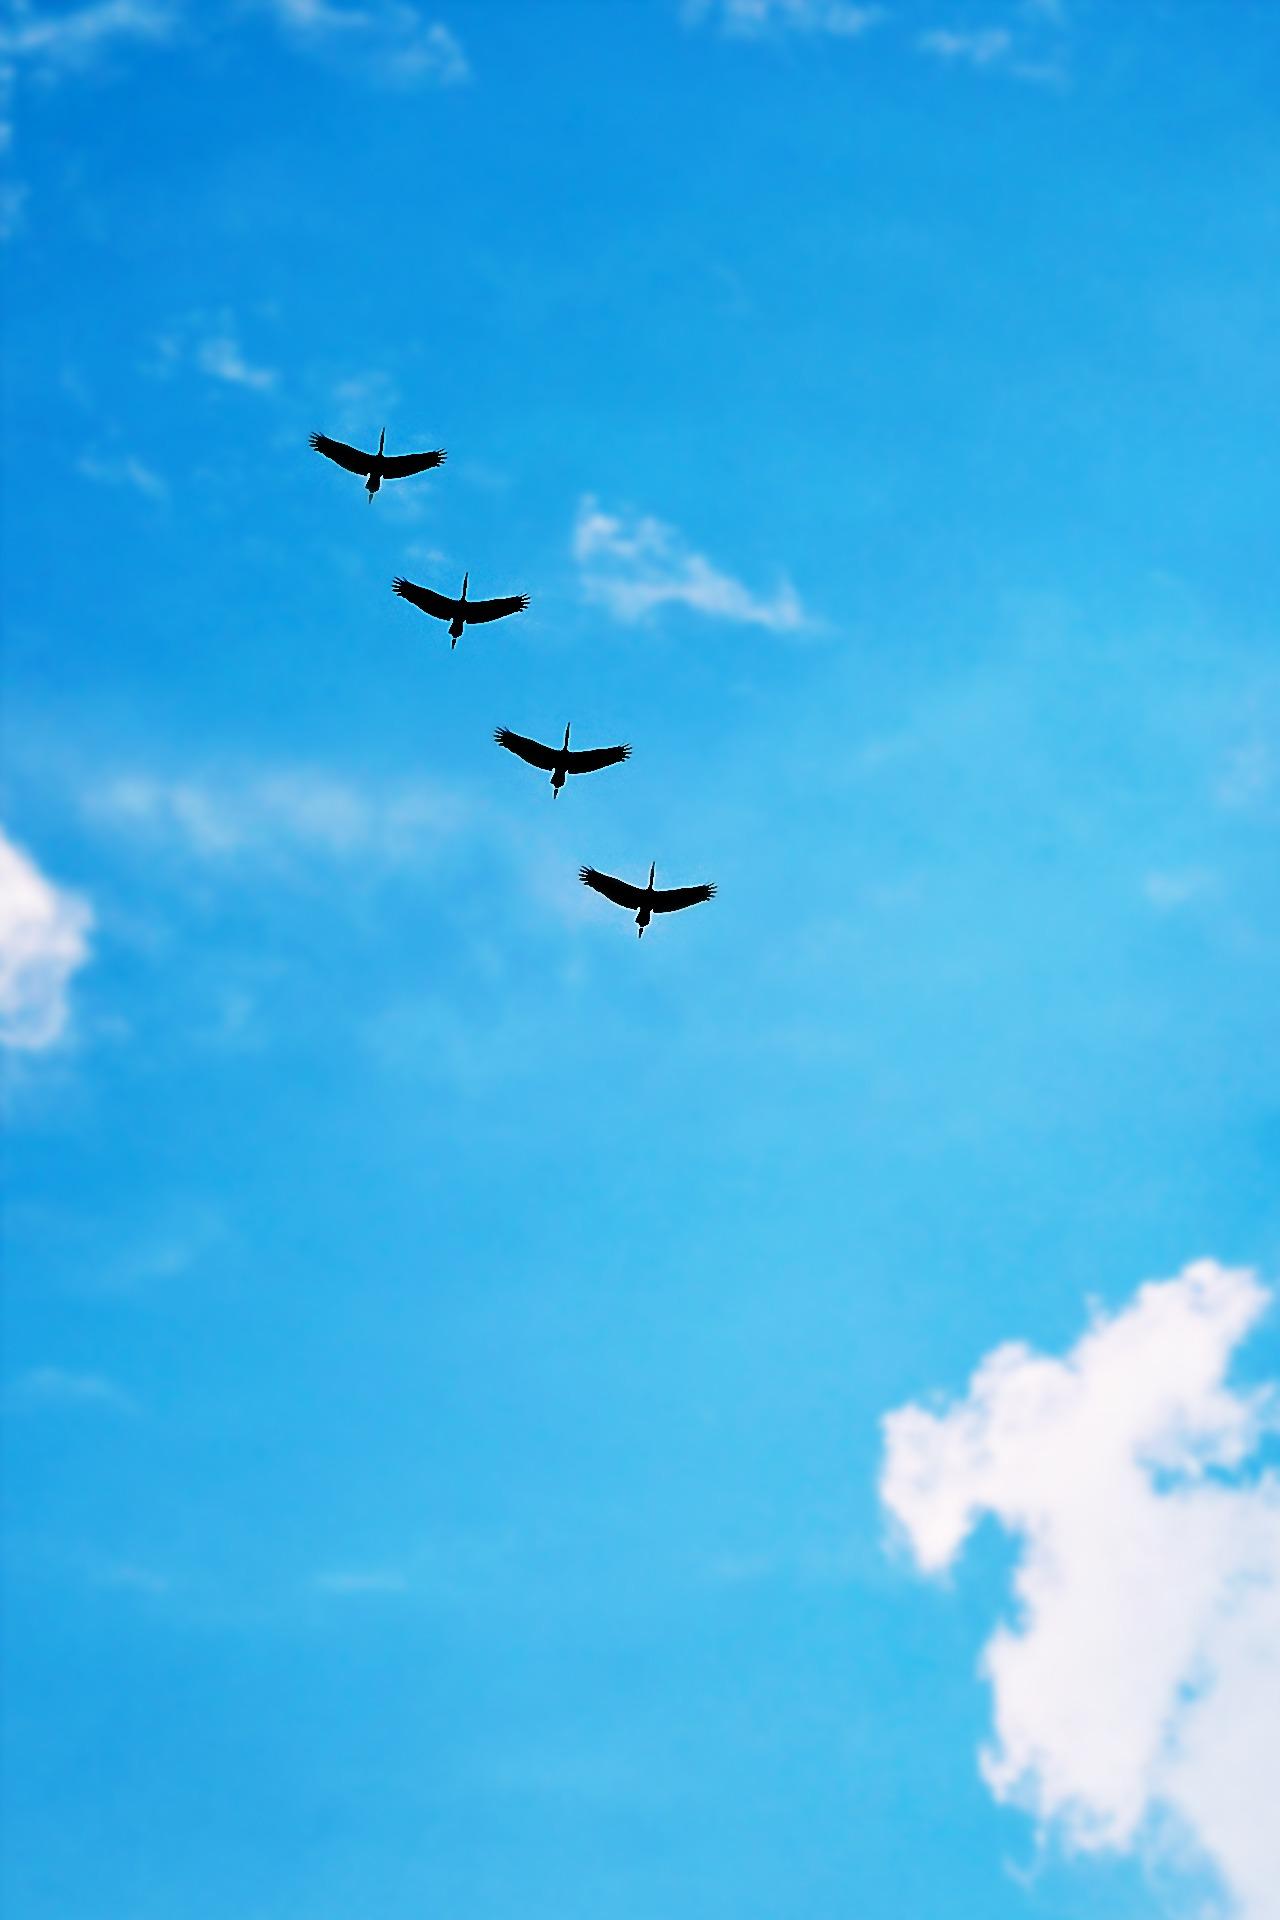 Black Bird Under Blue Calm Sky during Daytime  Free Stock